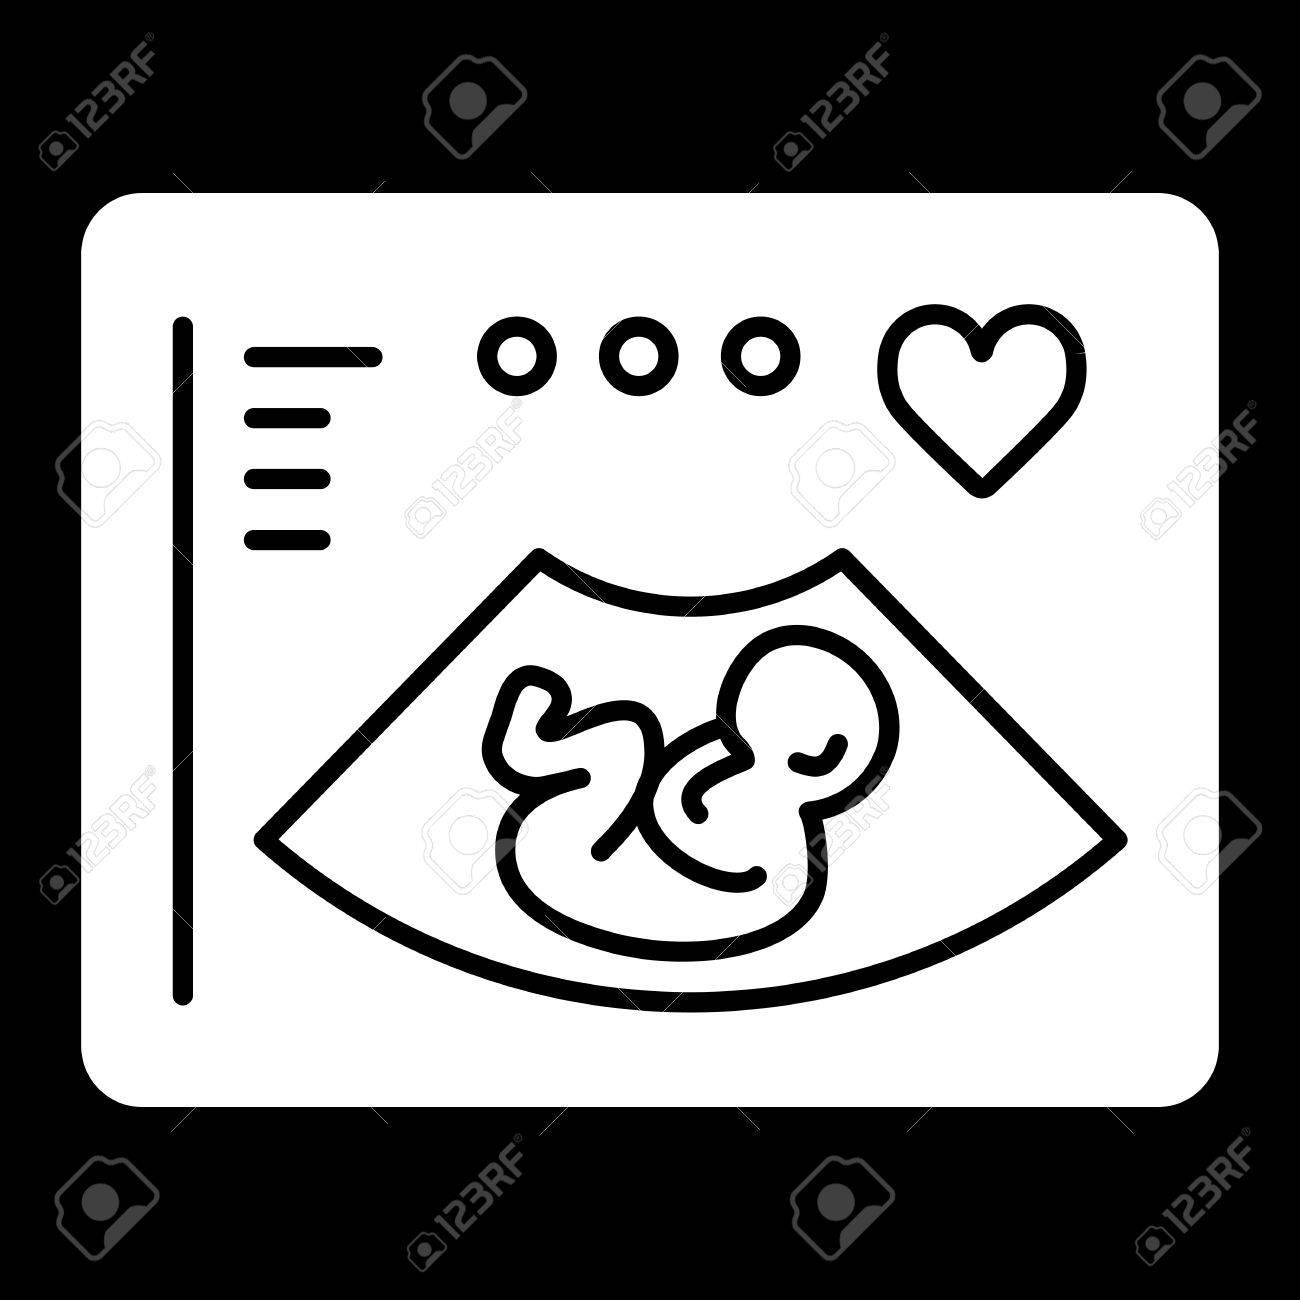 Ultraschall Vektor Symbol Schwarz Weiß Screening Baby Illustration